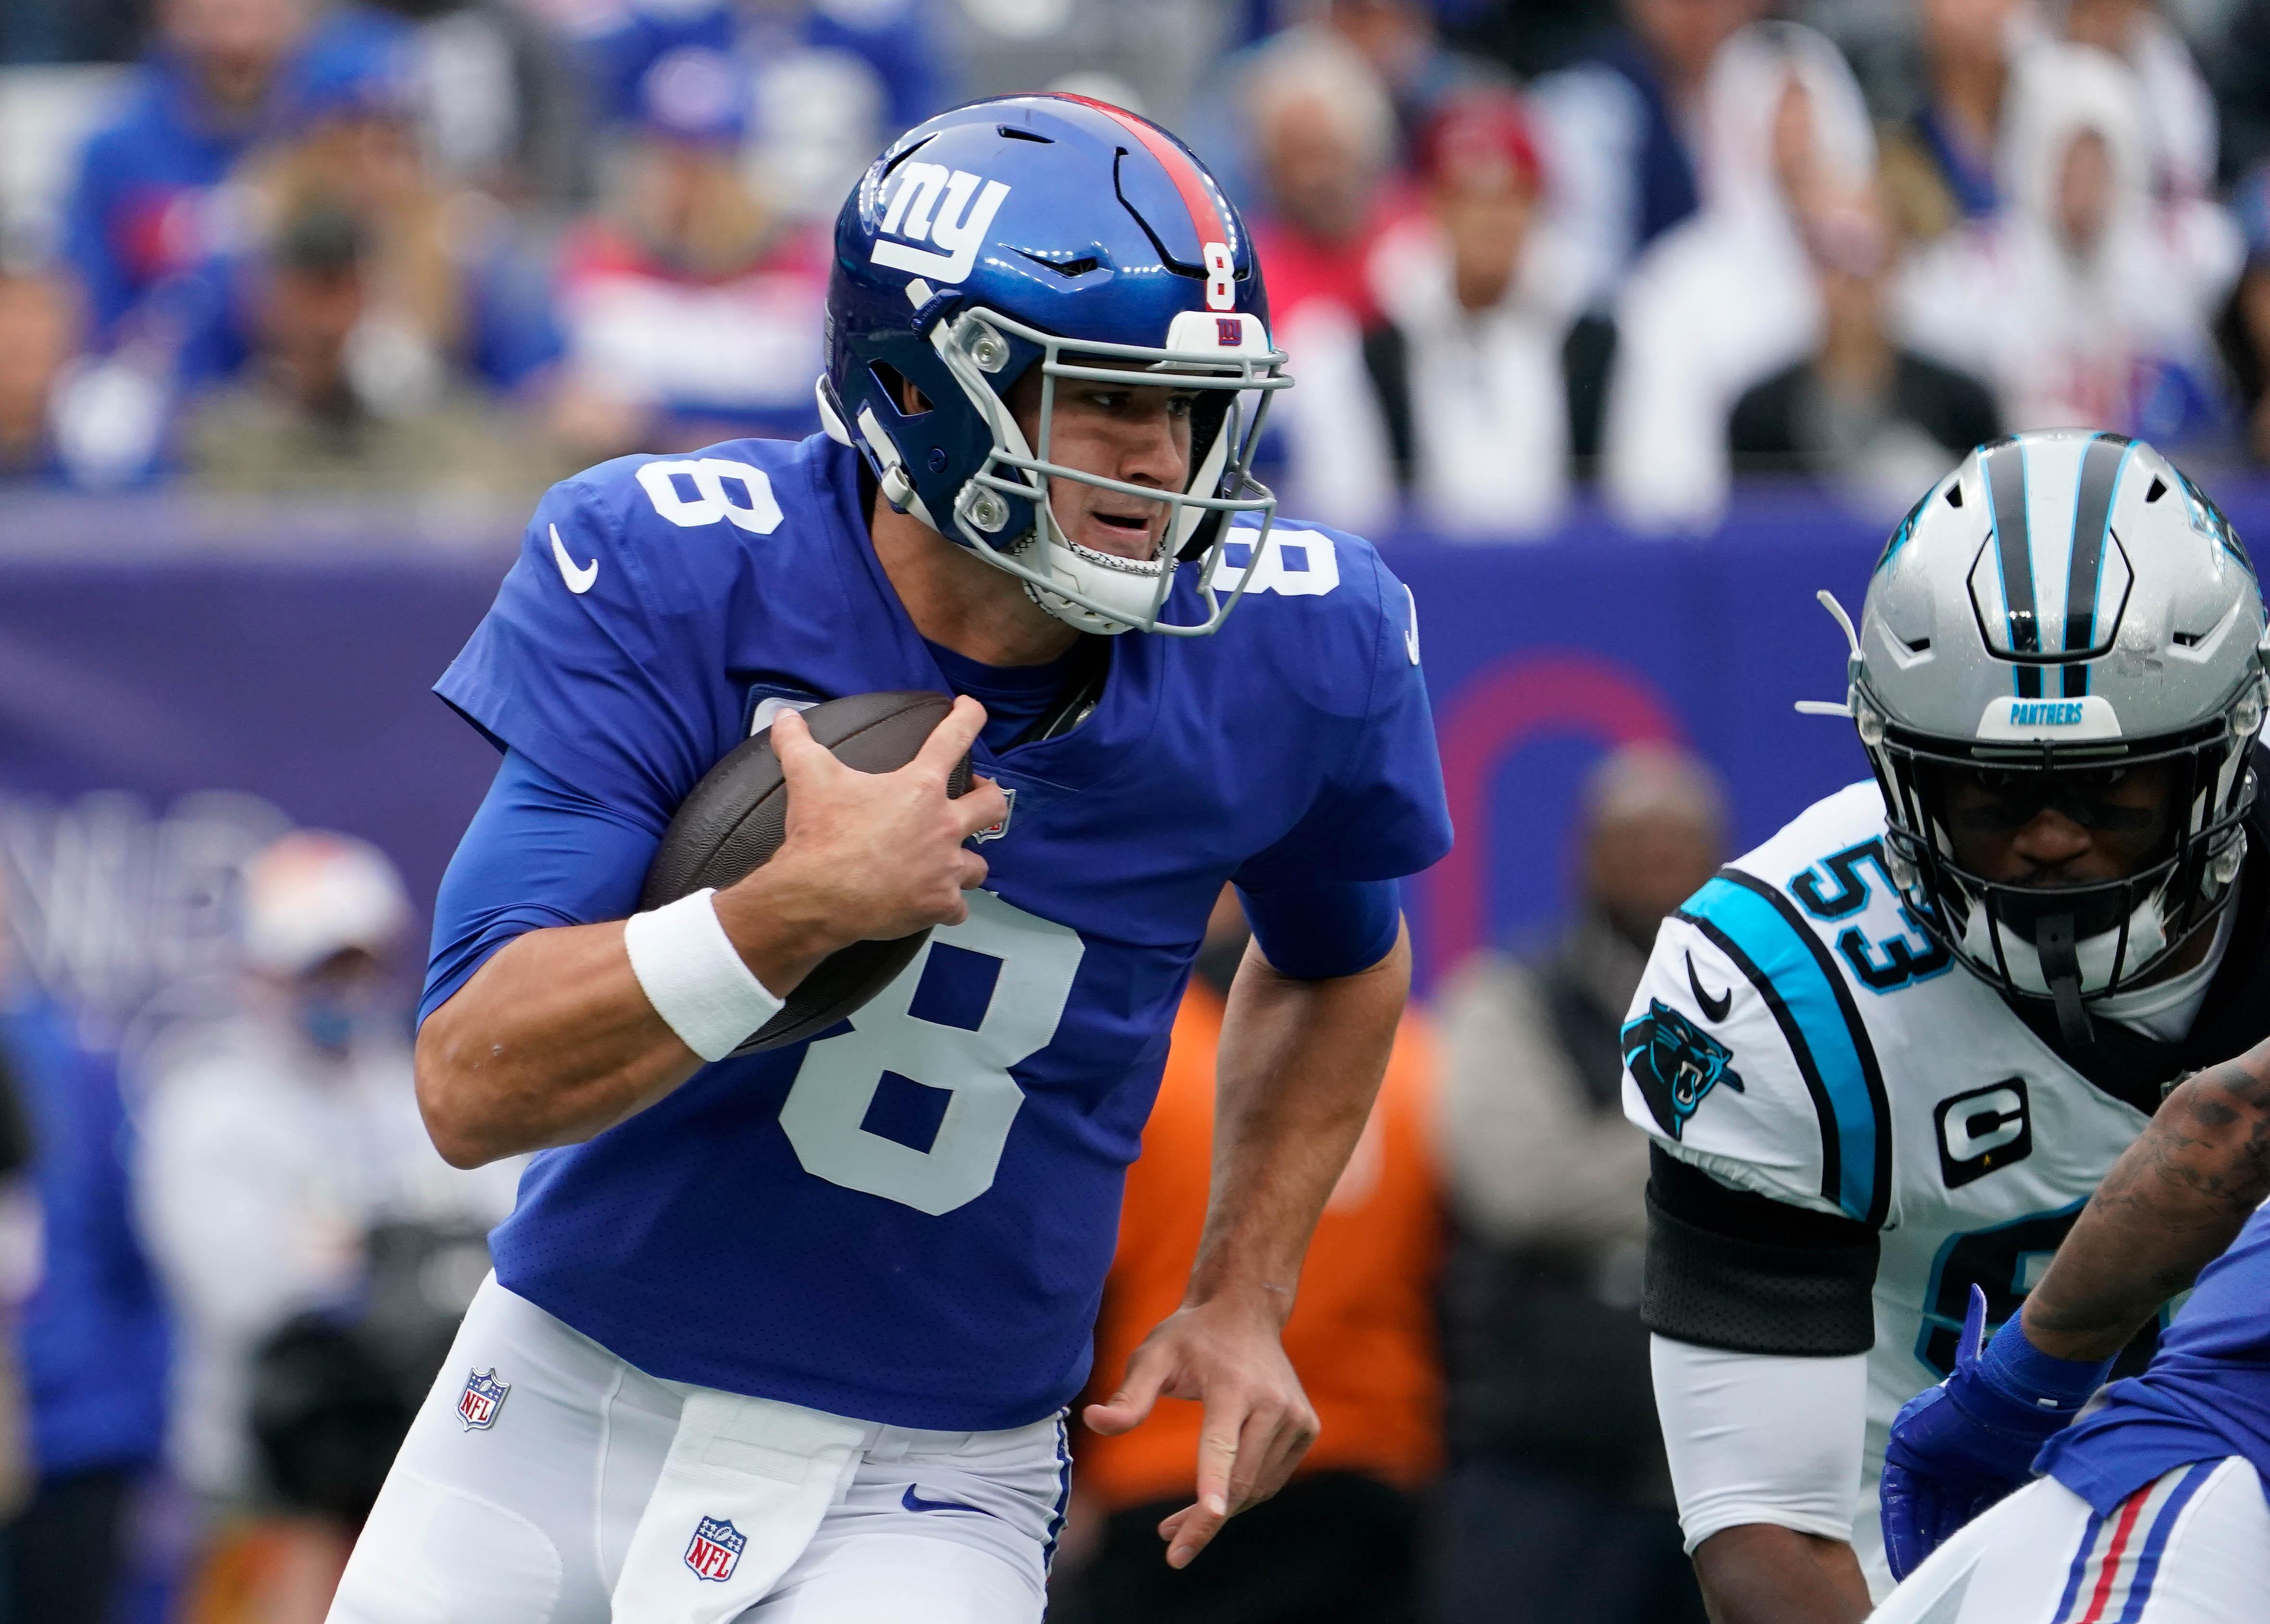 NFL: Carolina Panthers at New York Giants